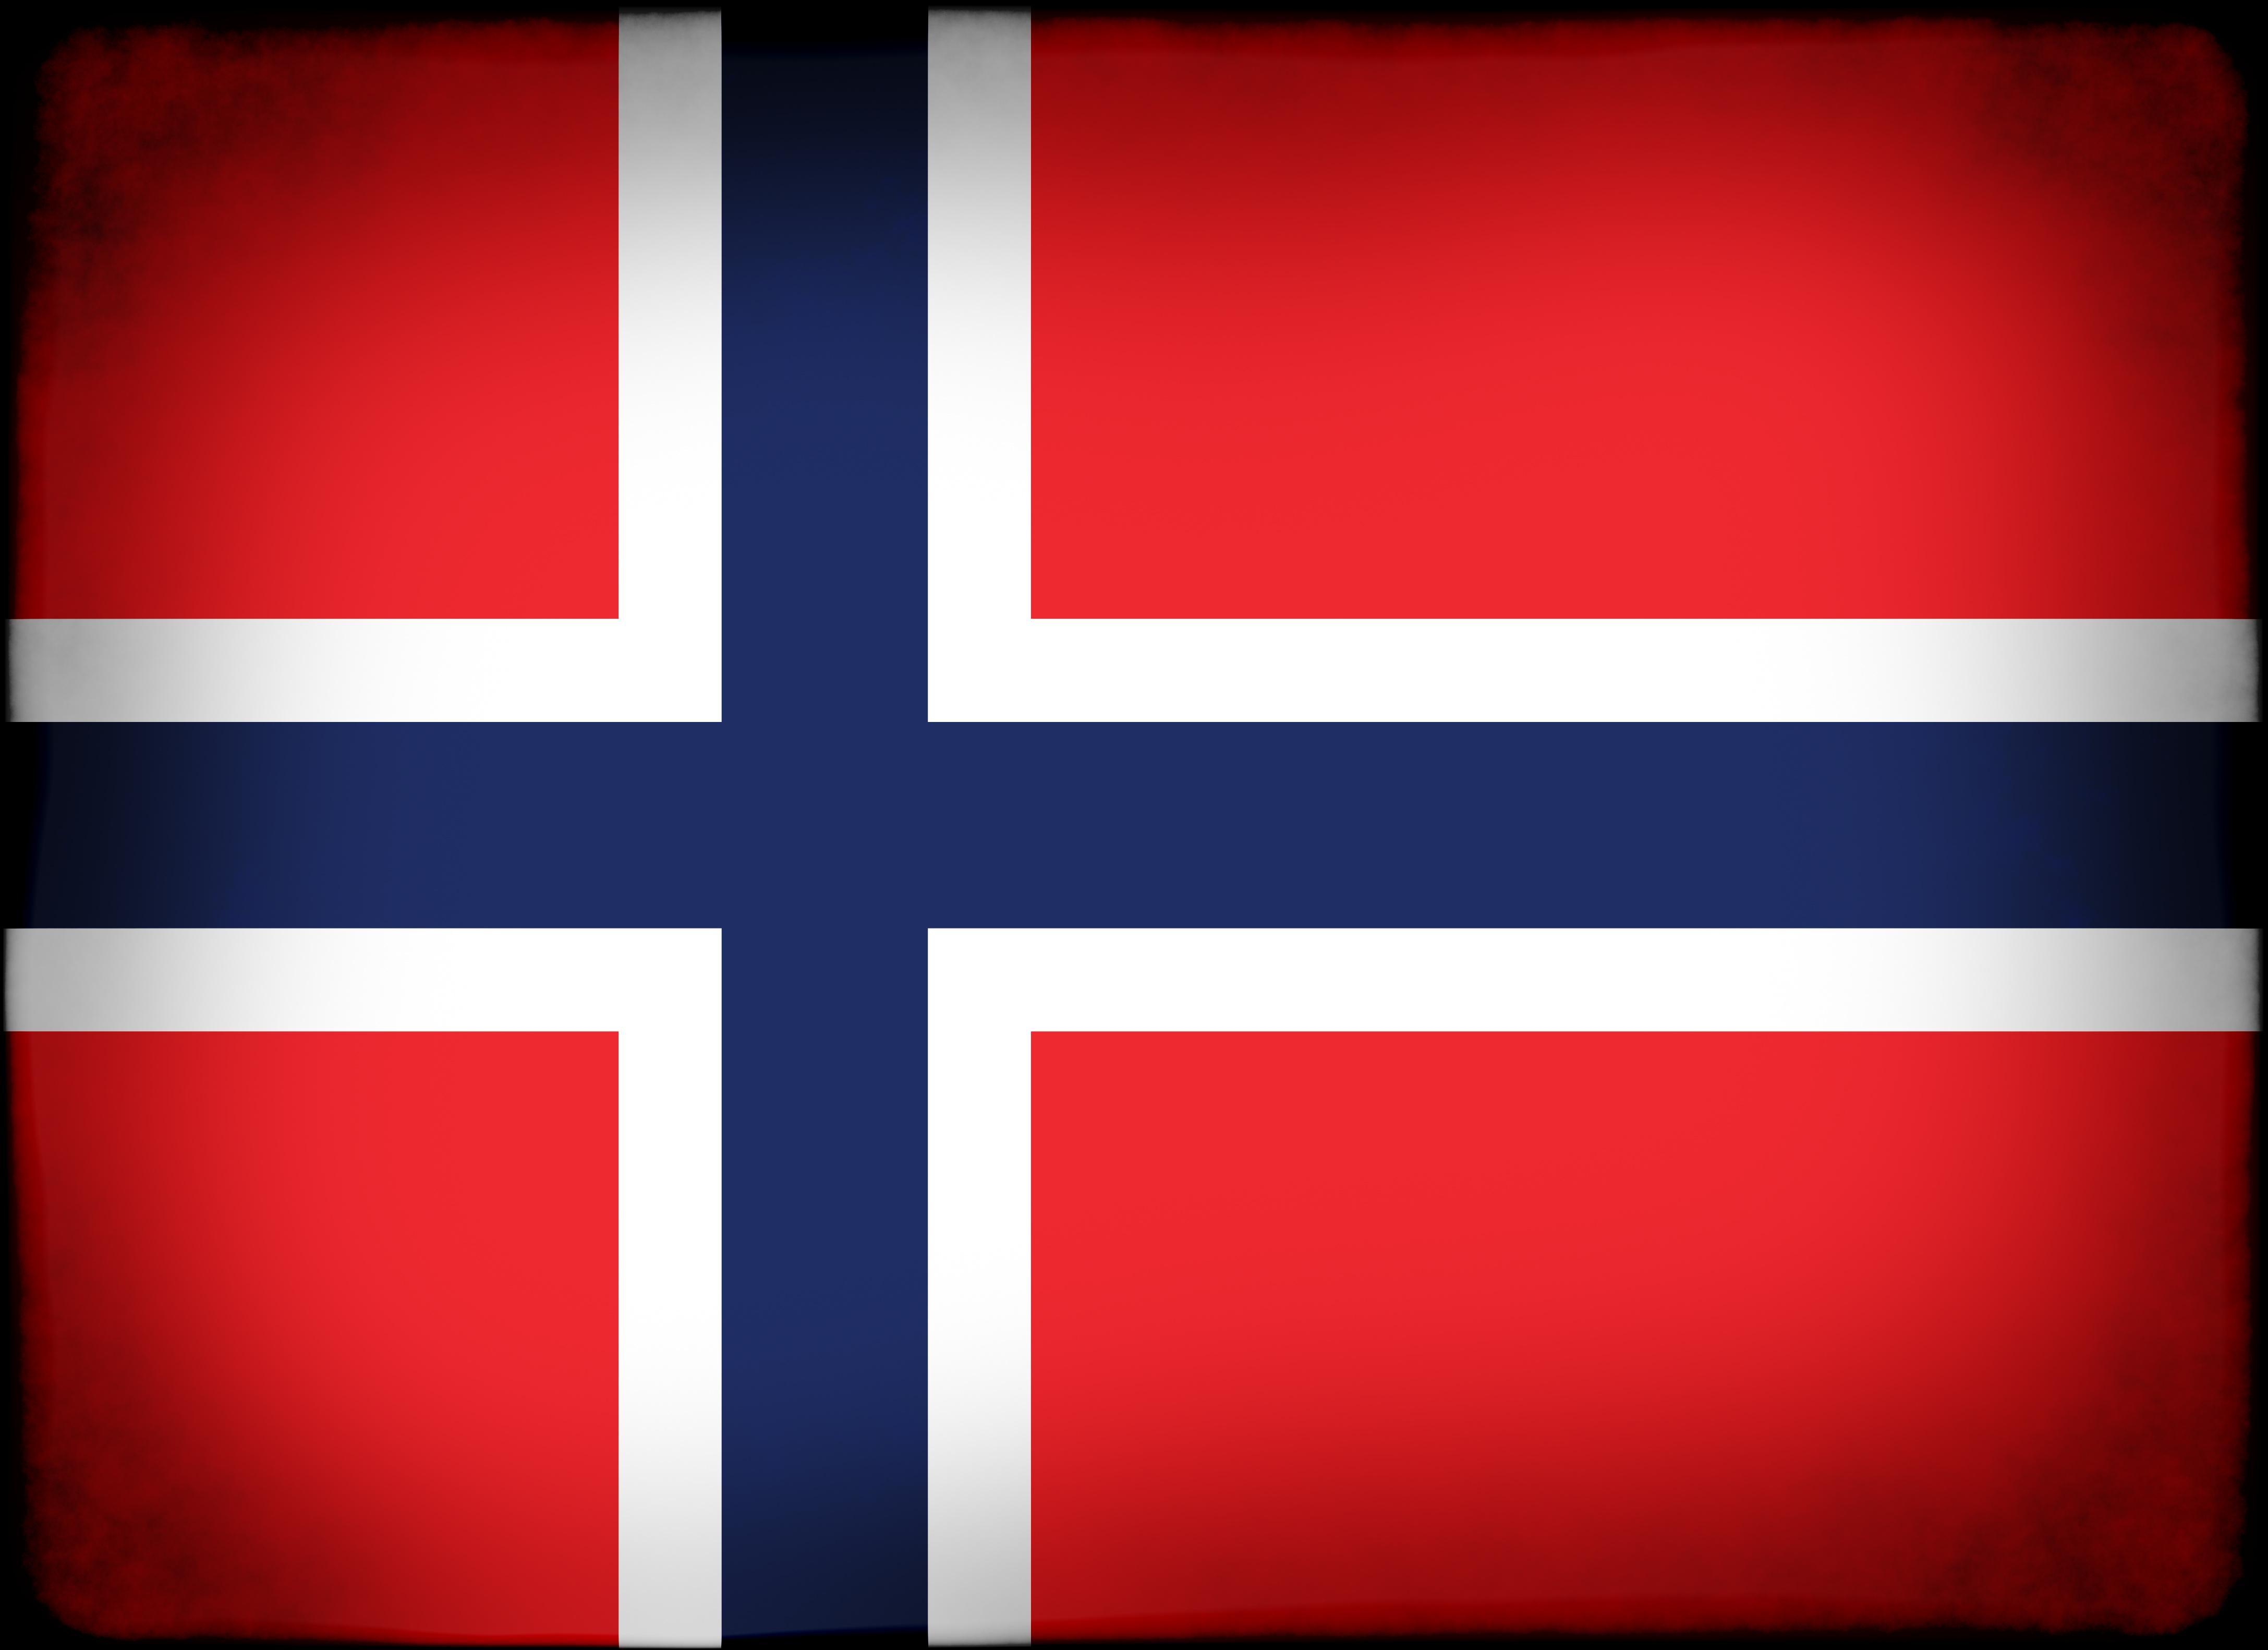 flag of norway 5 public domain photos